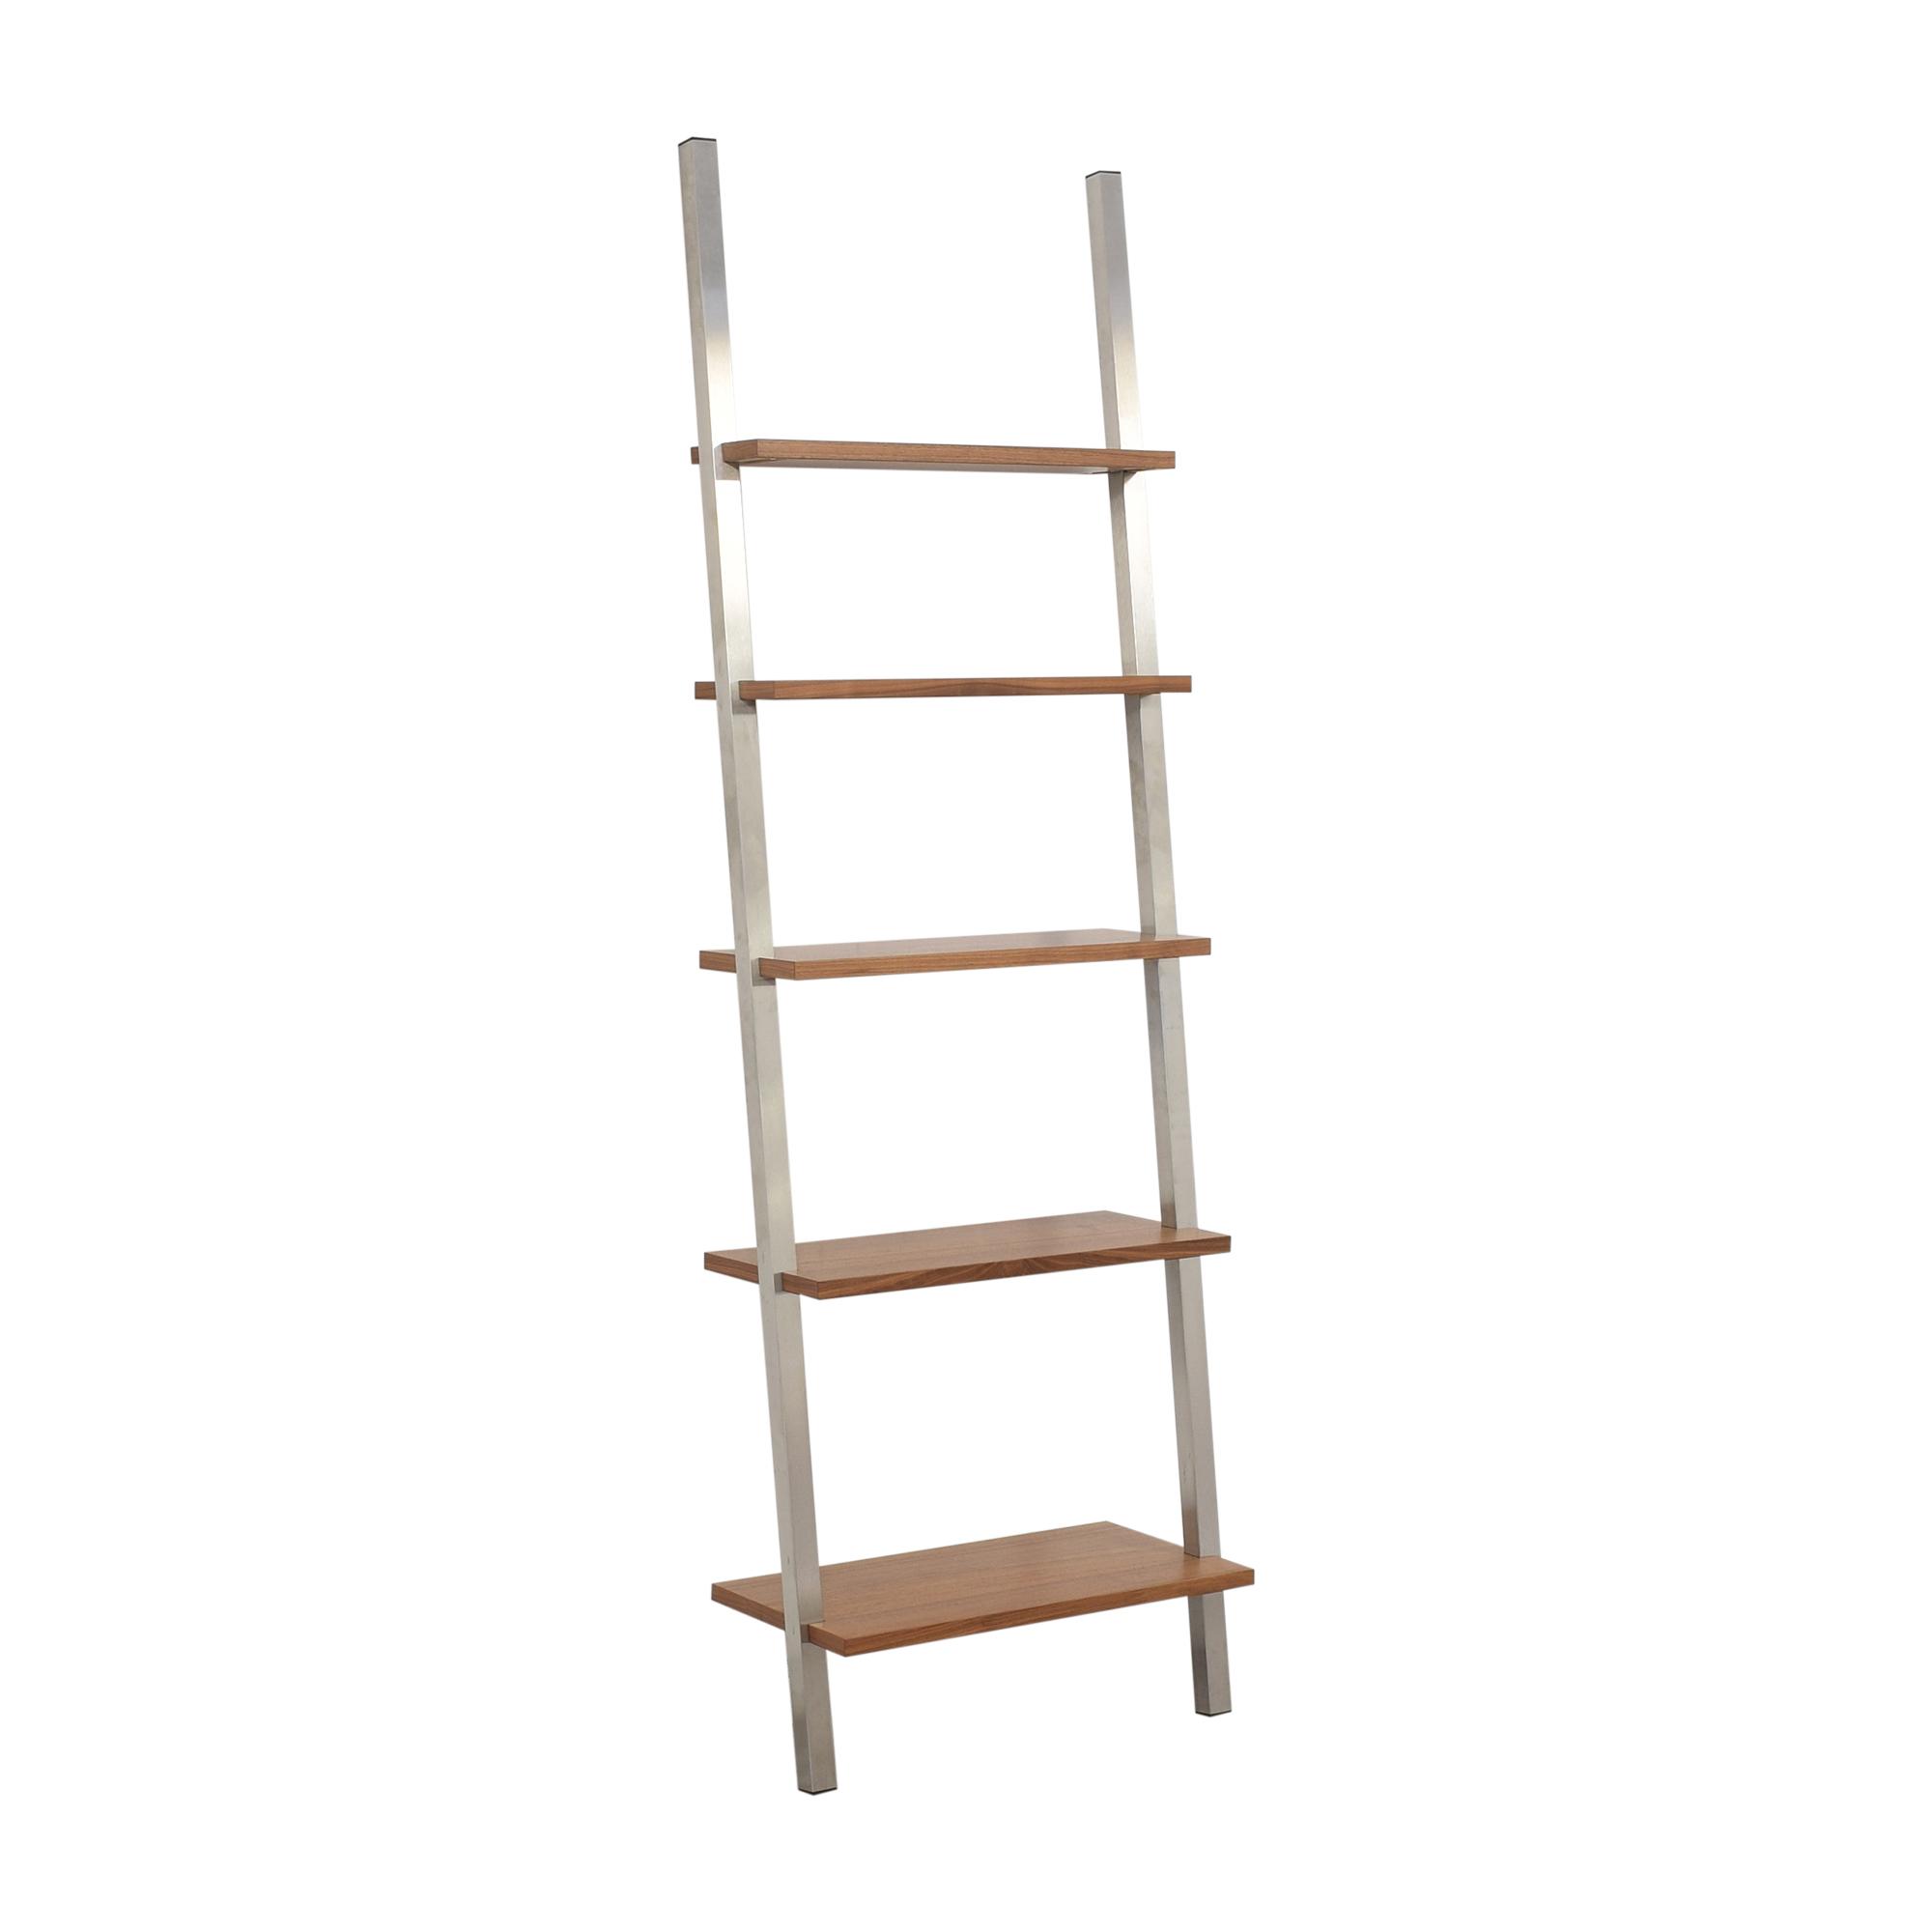 Room & Board Gallery Leaning Shelves sale